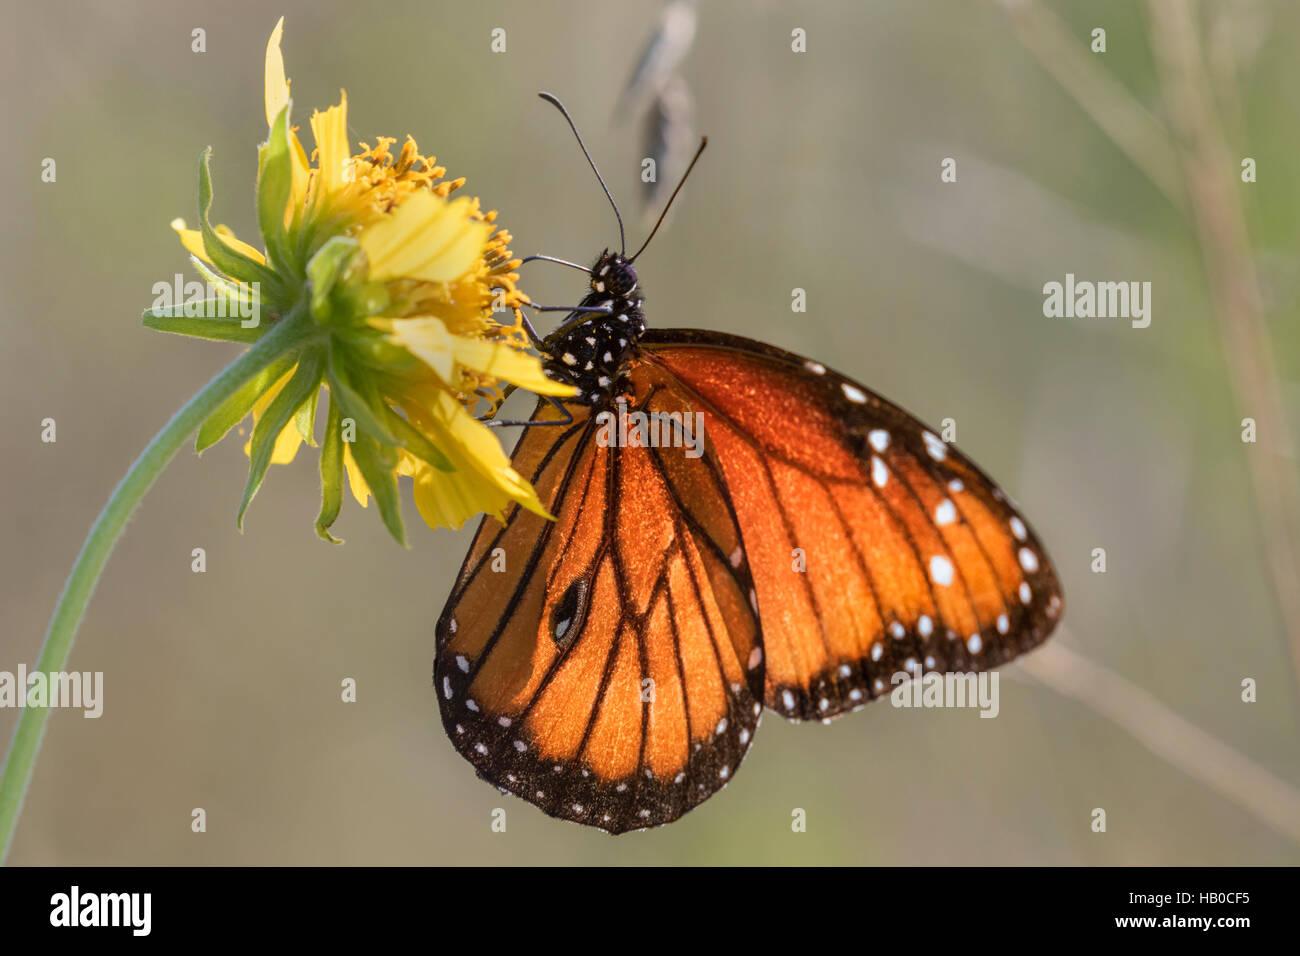 Reina butterfly (Danaus gilippus) materna en una soleada pradera, Aransas, Texas, EE.UU. Imagen De Stock